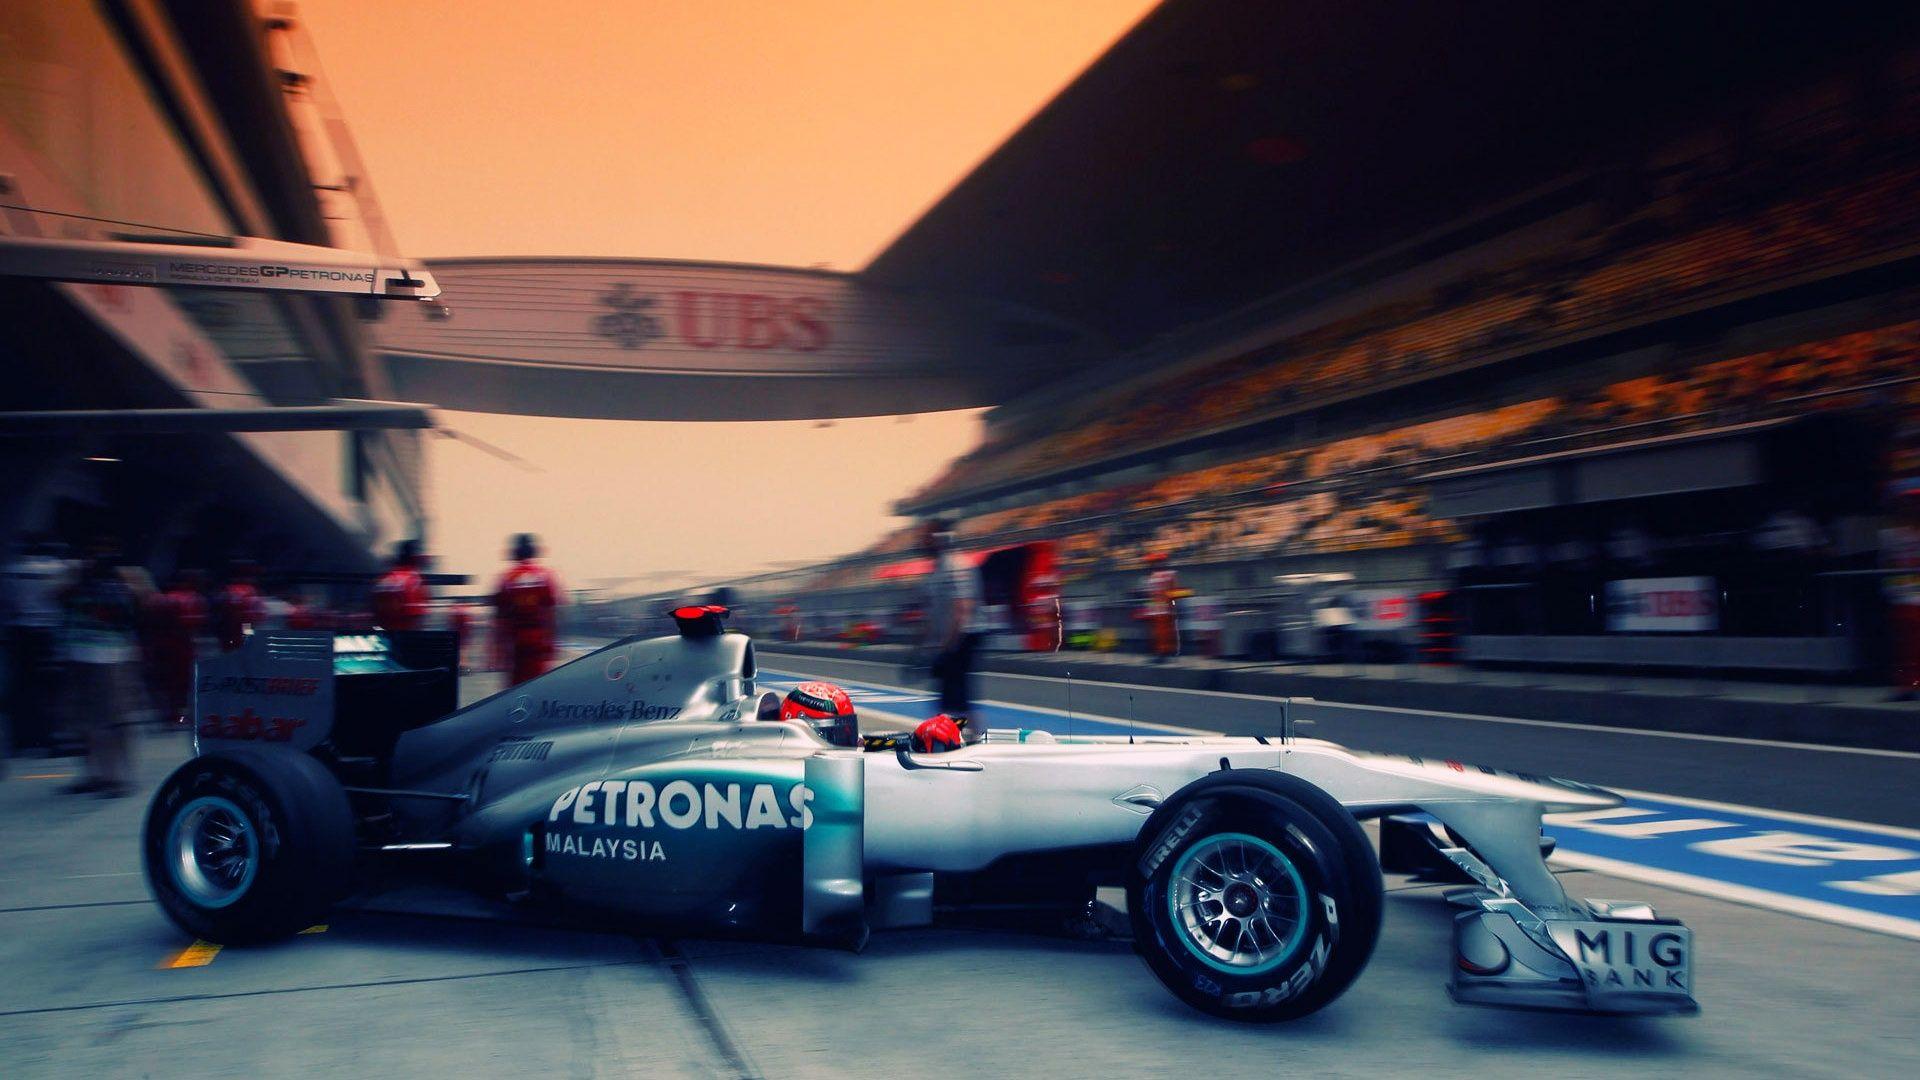 Hand Picked Beautiful Formula 1 Wallpapers Crispme F1 Racing